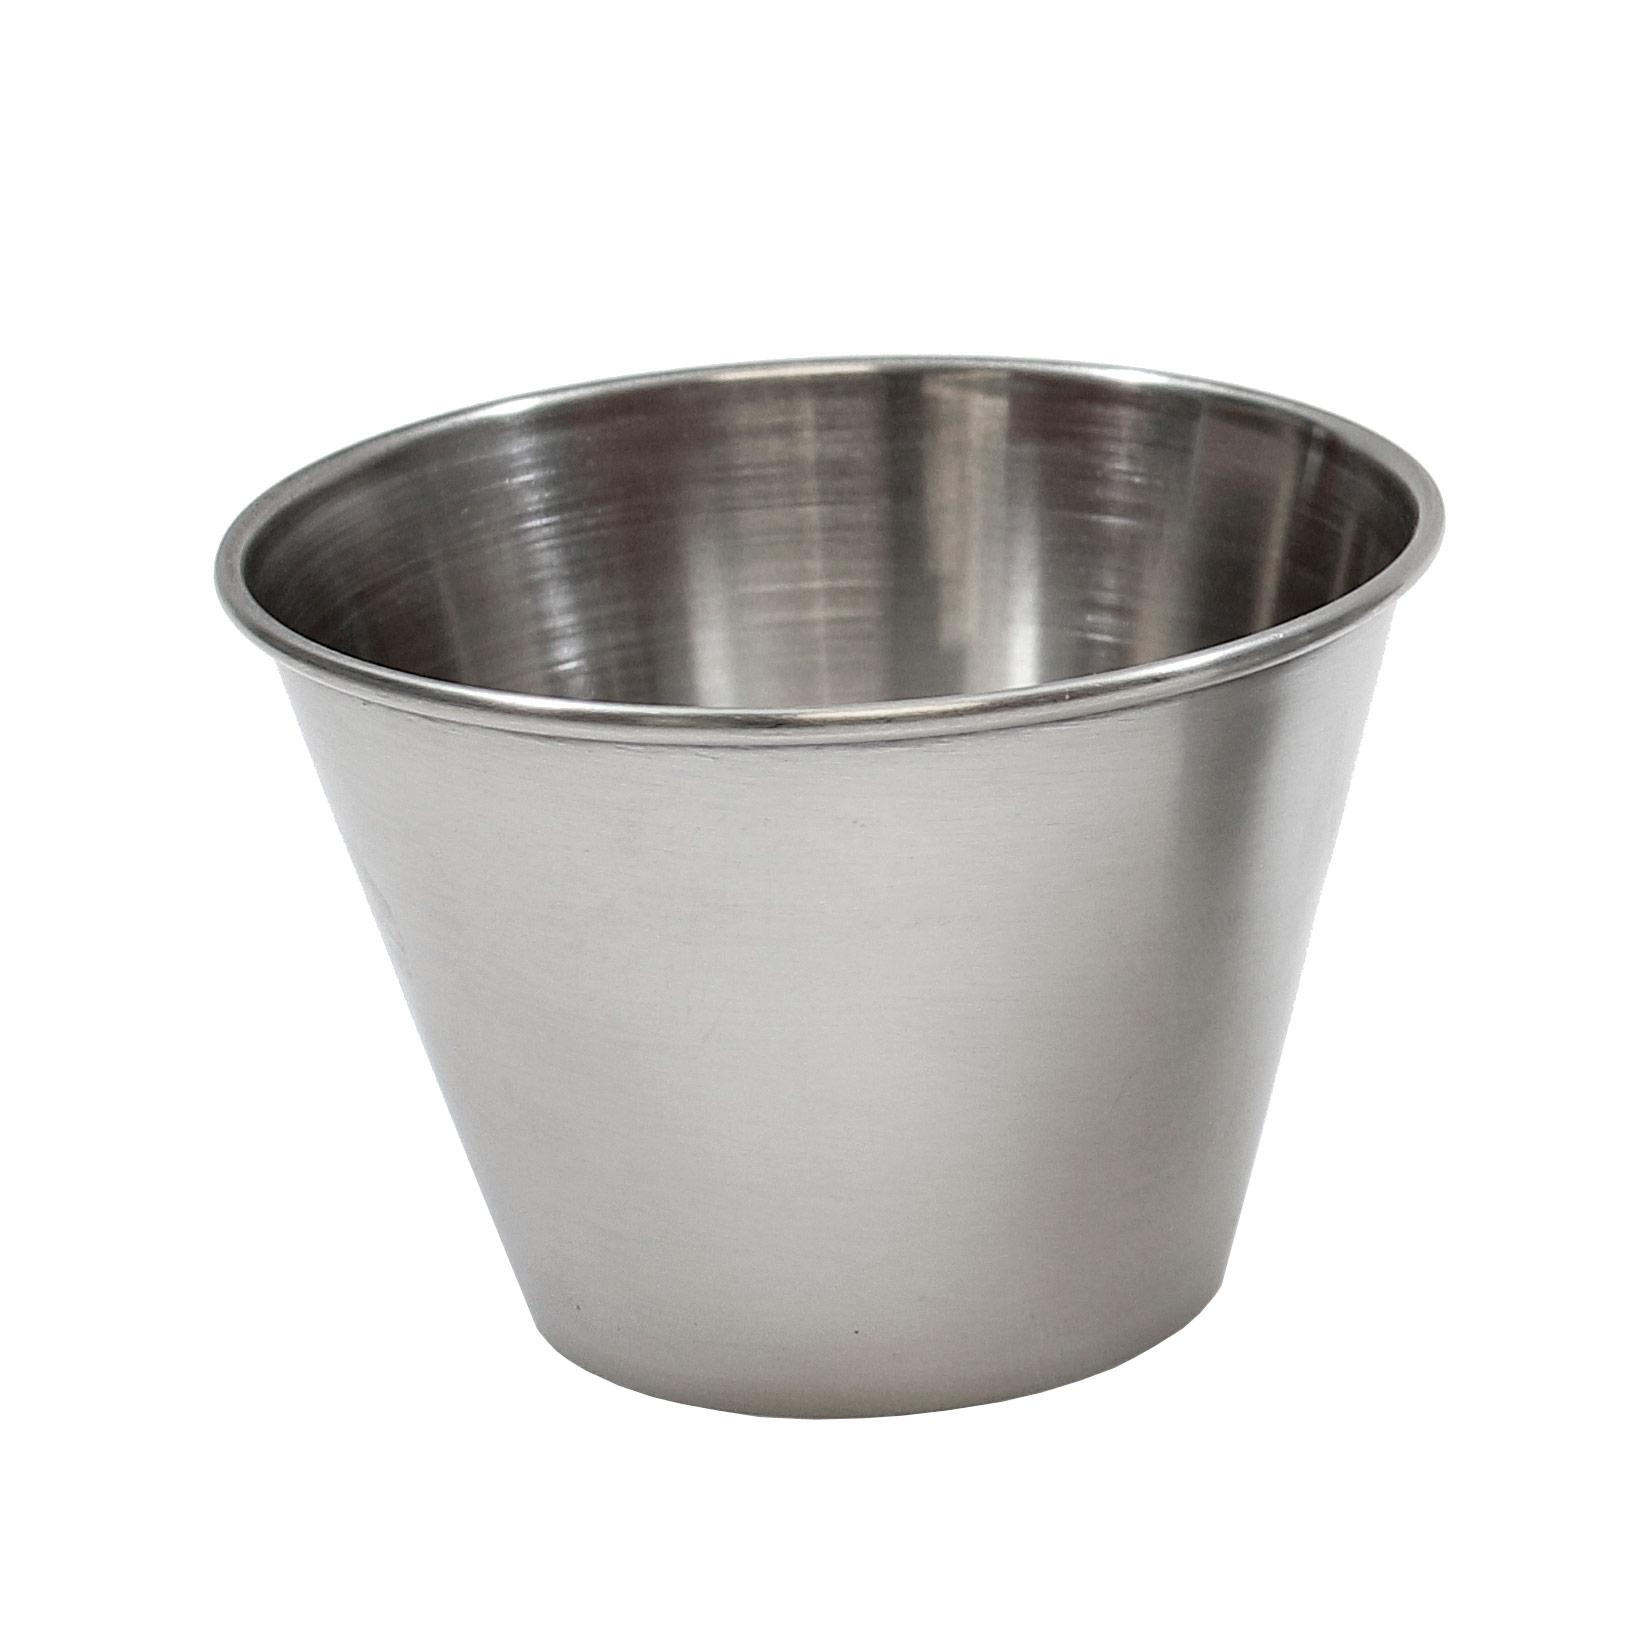 TableCraft Products 5071 ramekin / sauce cup, metal